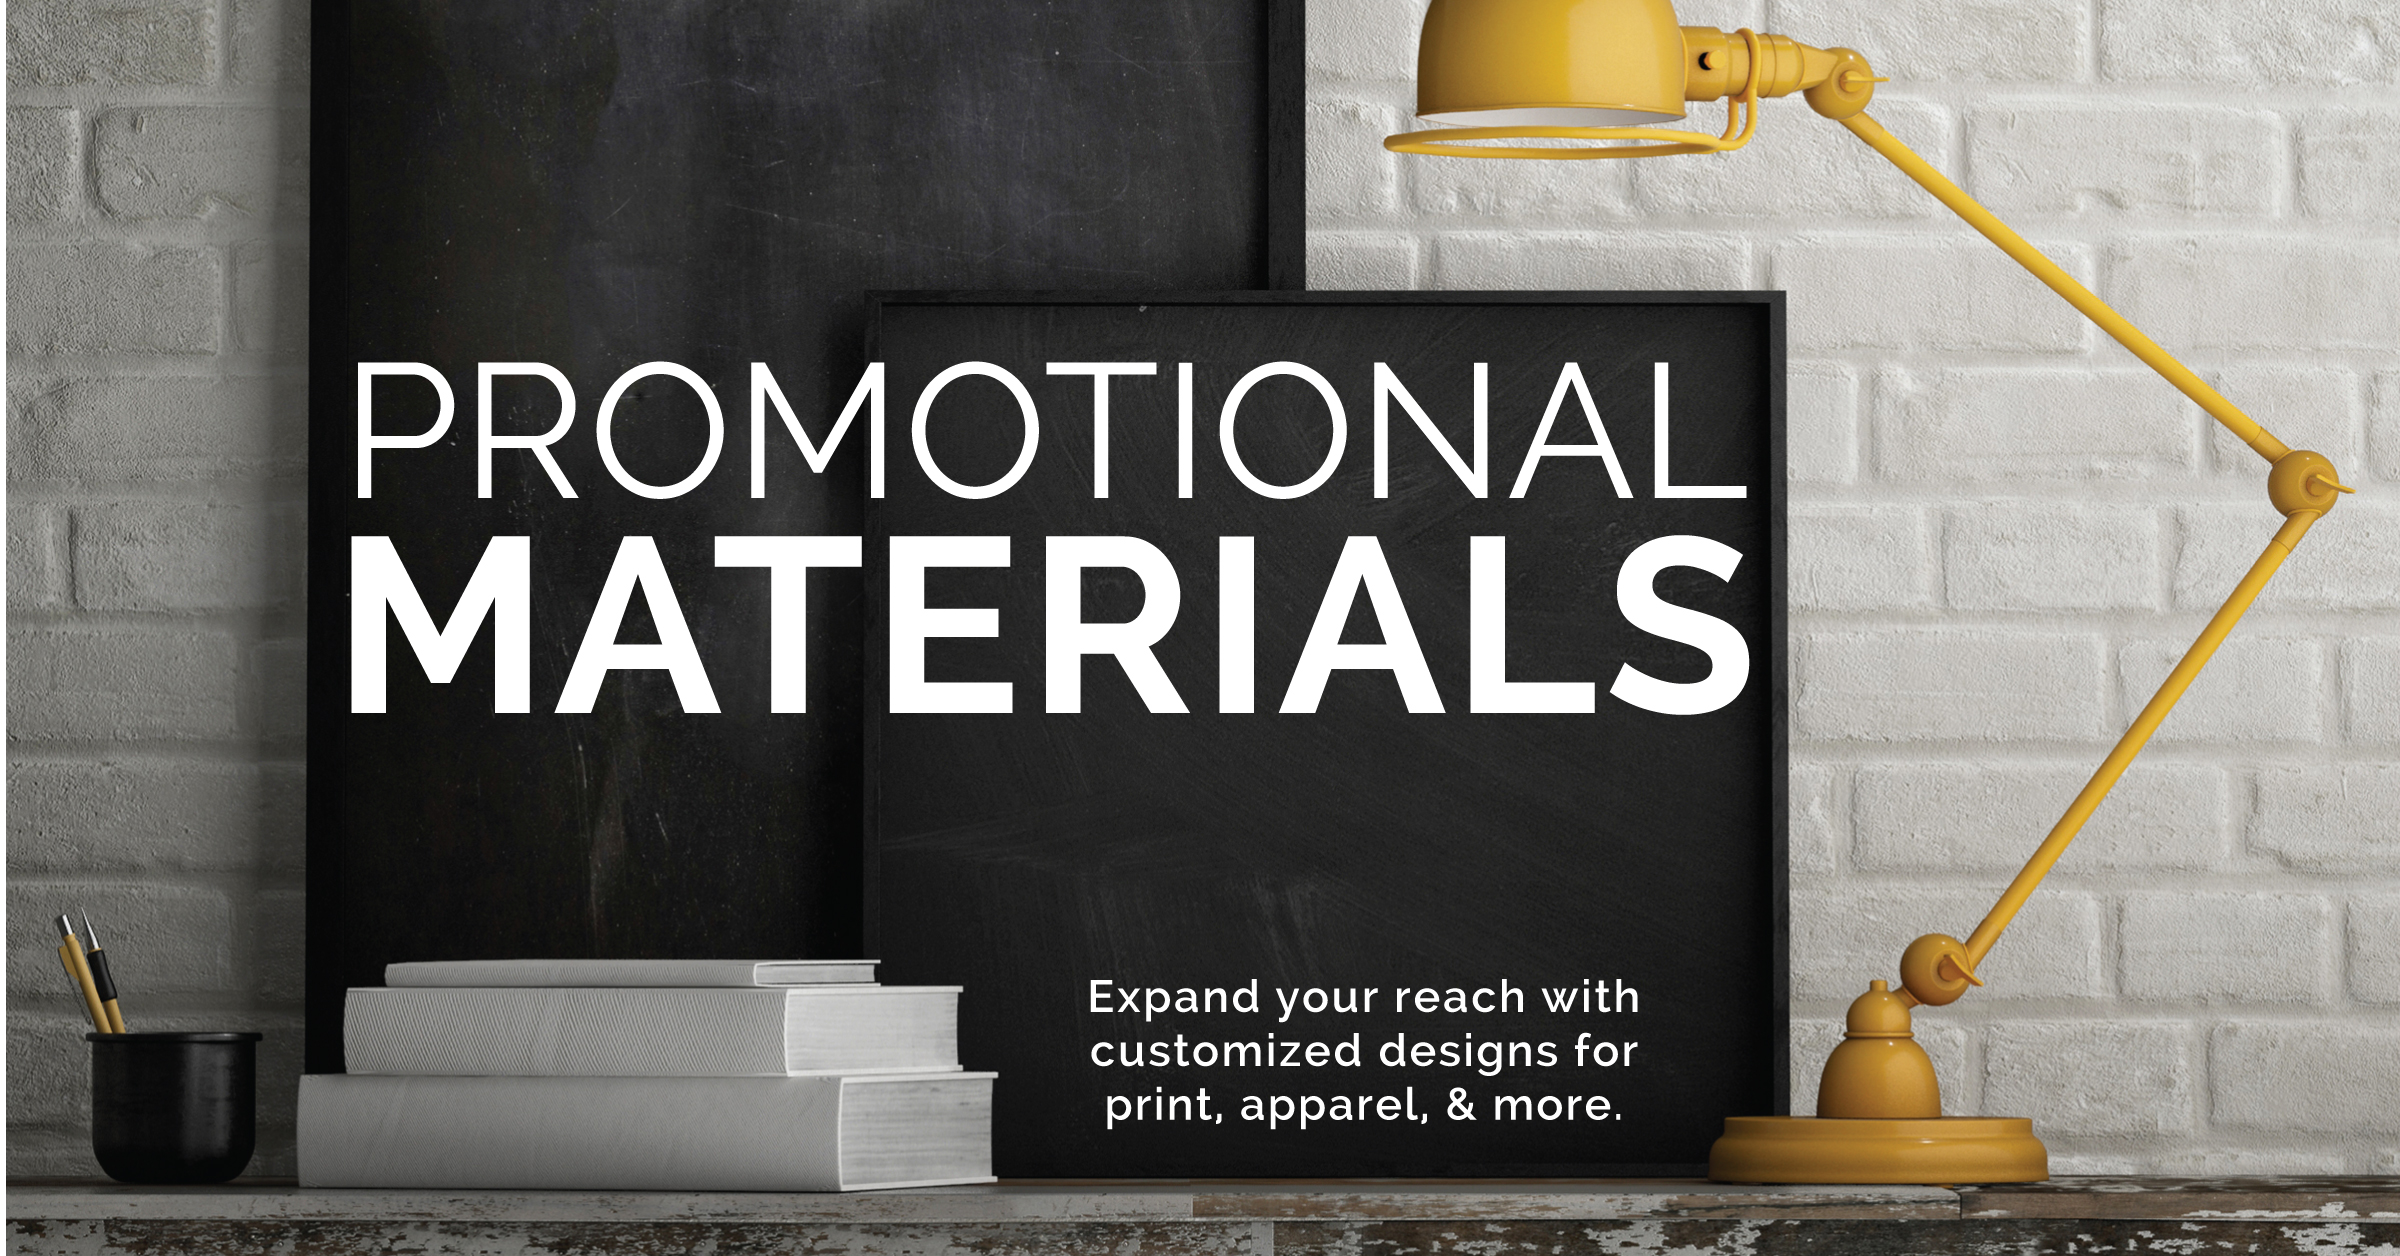 promotional-materials_2.jpg